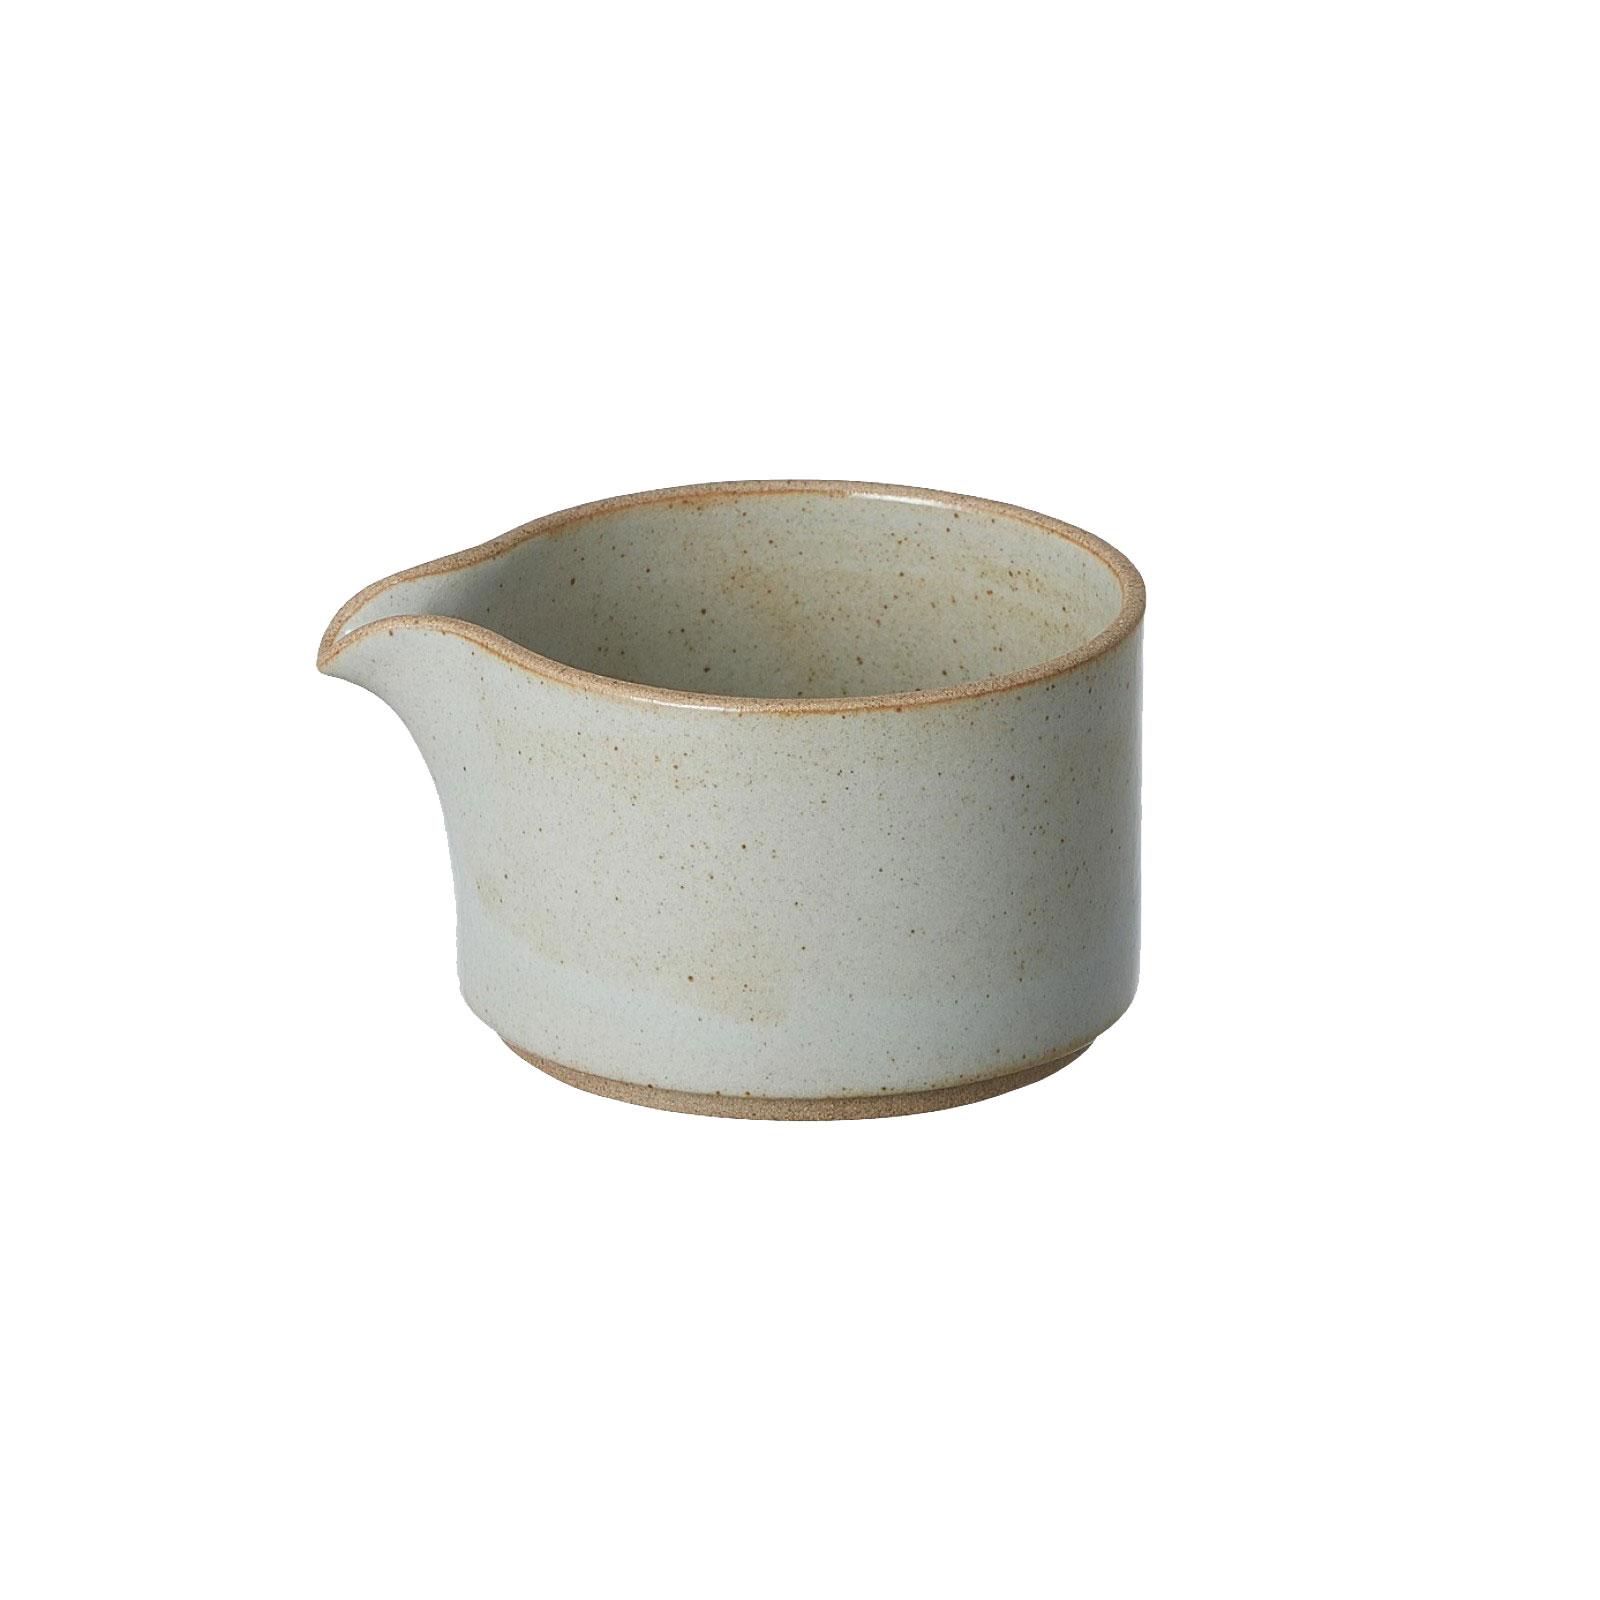 HPM028 Hasami Milk Pitcher grey glossy